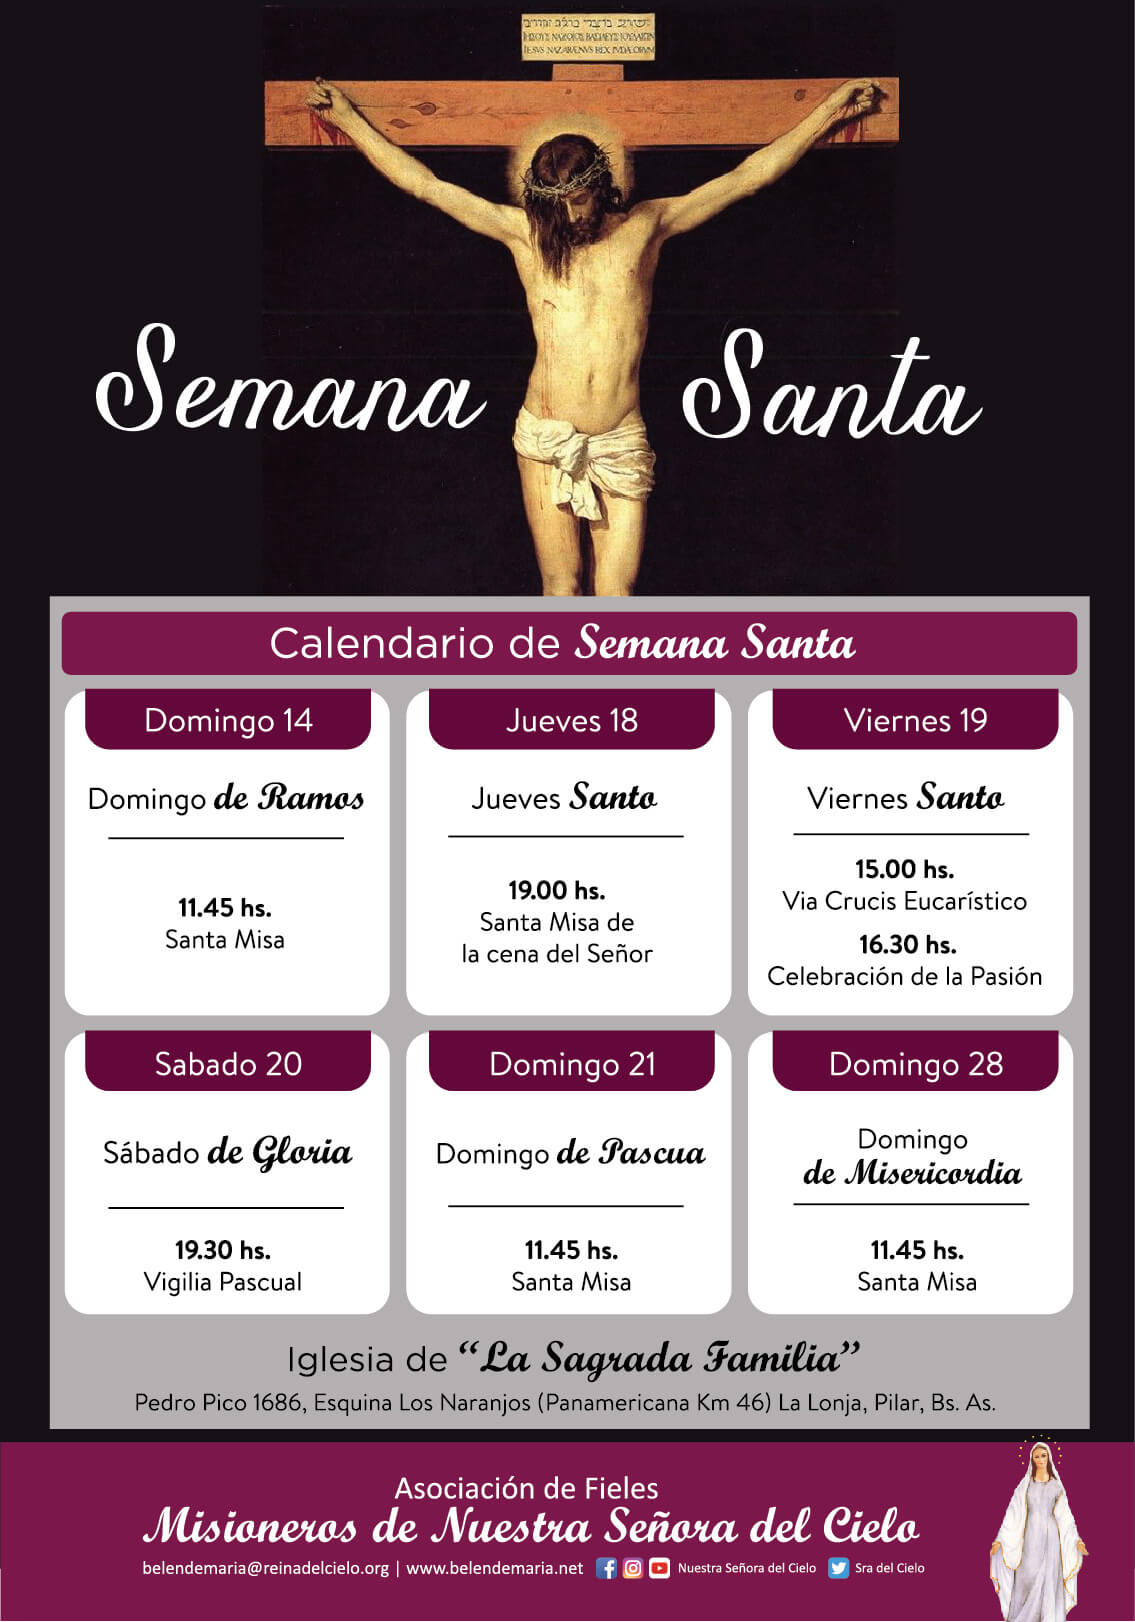 "Semana Santa en la Iglesia ""La Sagrada Familia"" ⛪ nuestra sede en Pilar ✝"